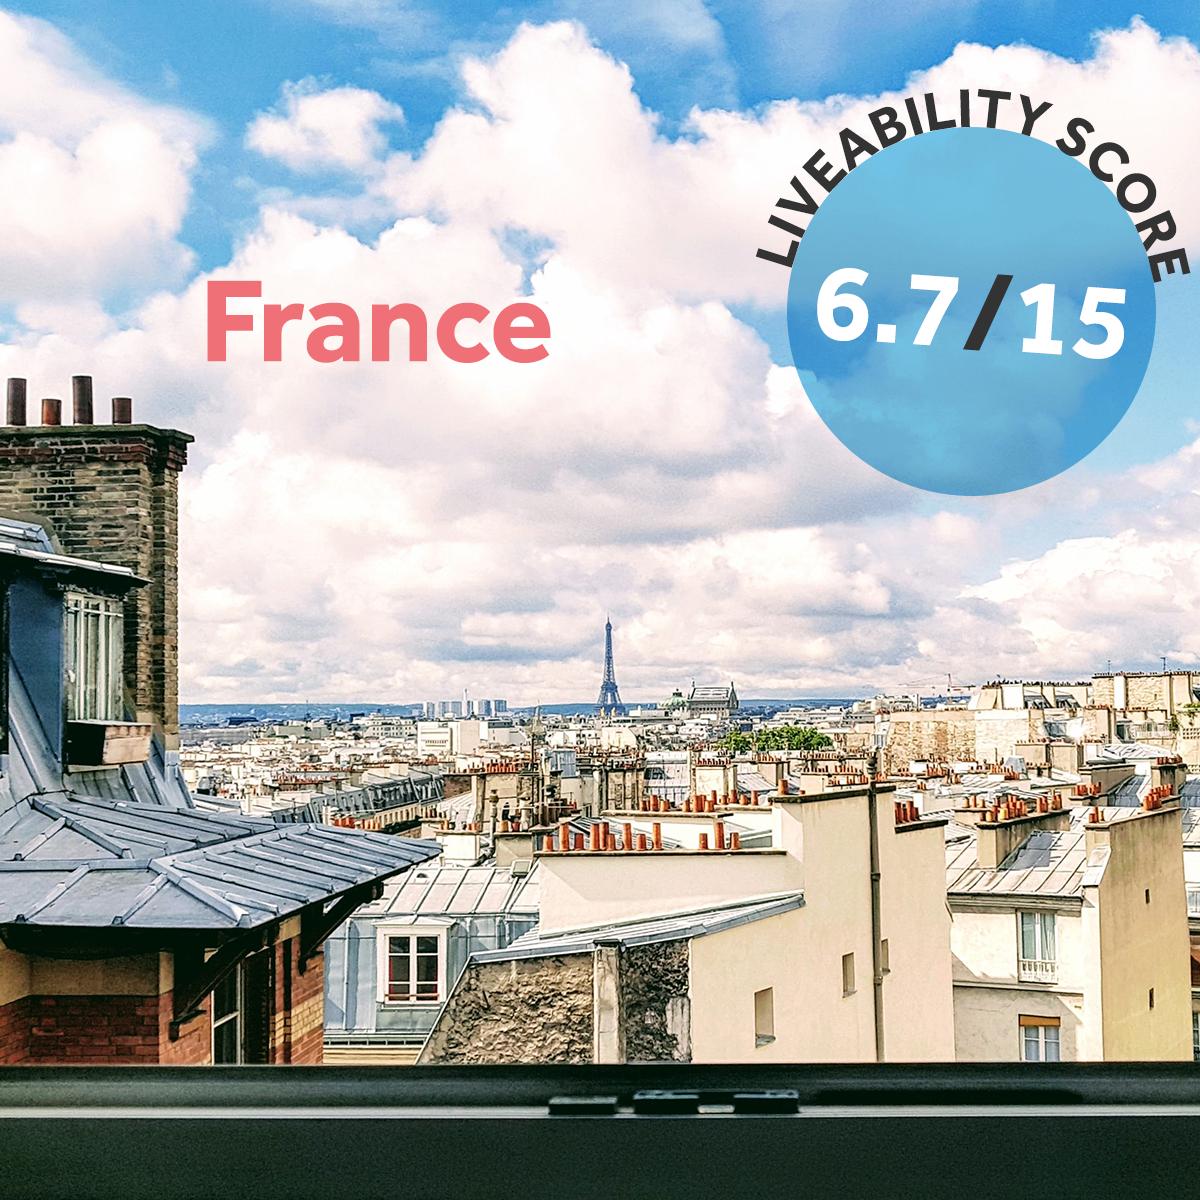 France UK Expat Index